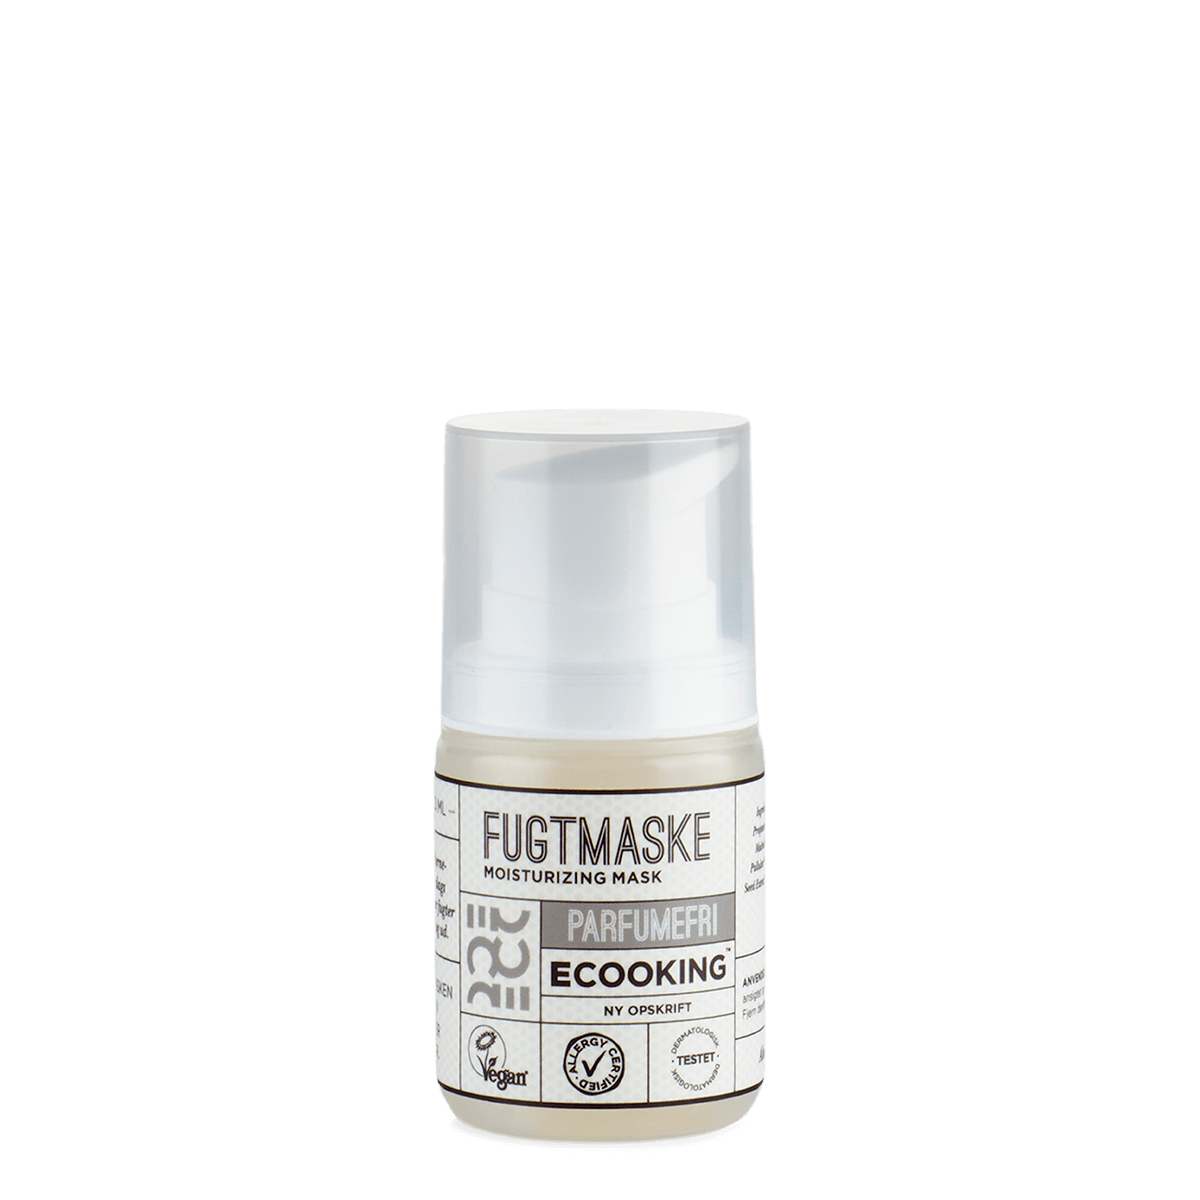 Fugtmaske Parfumefri 50 ml